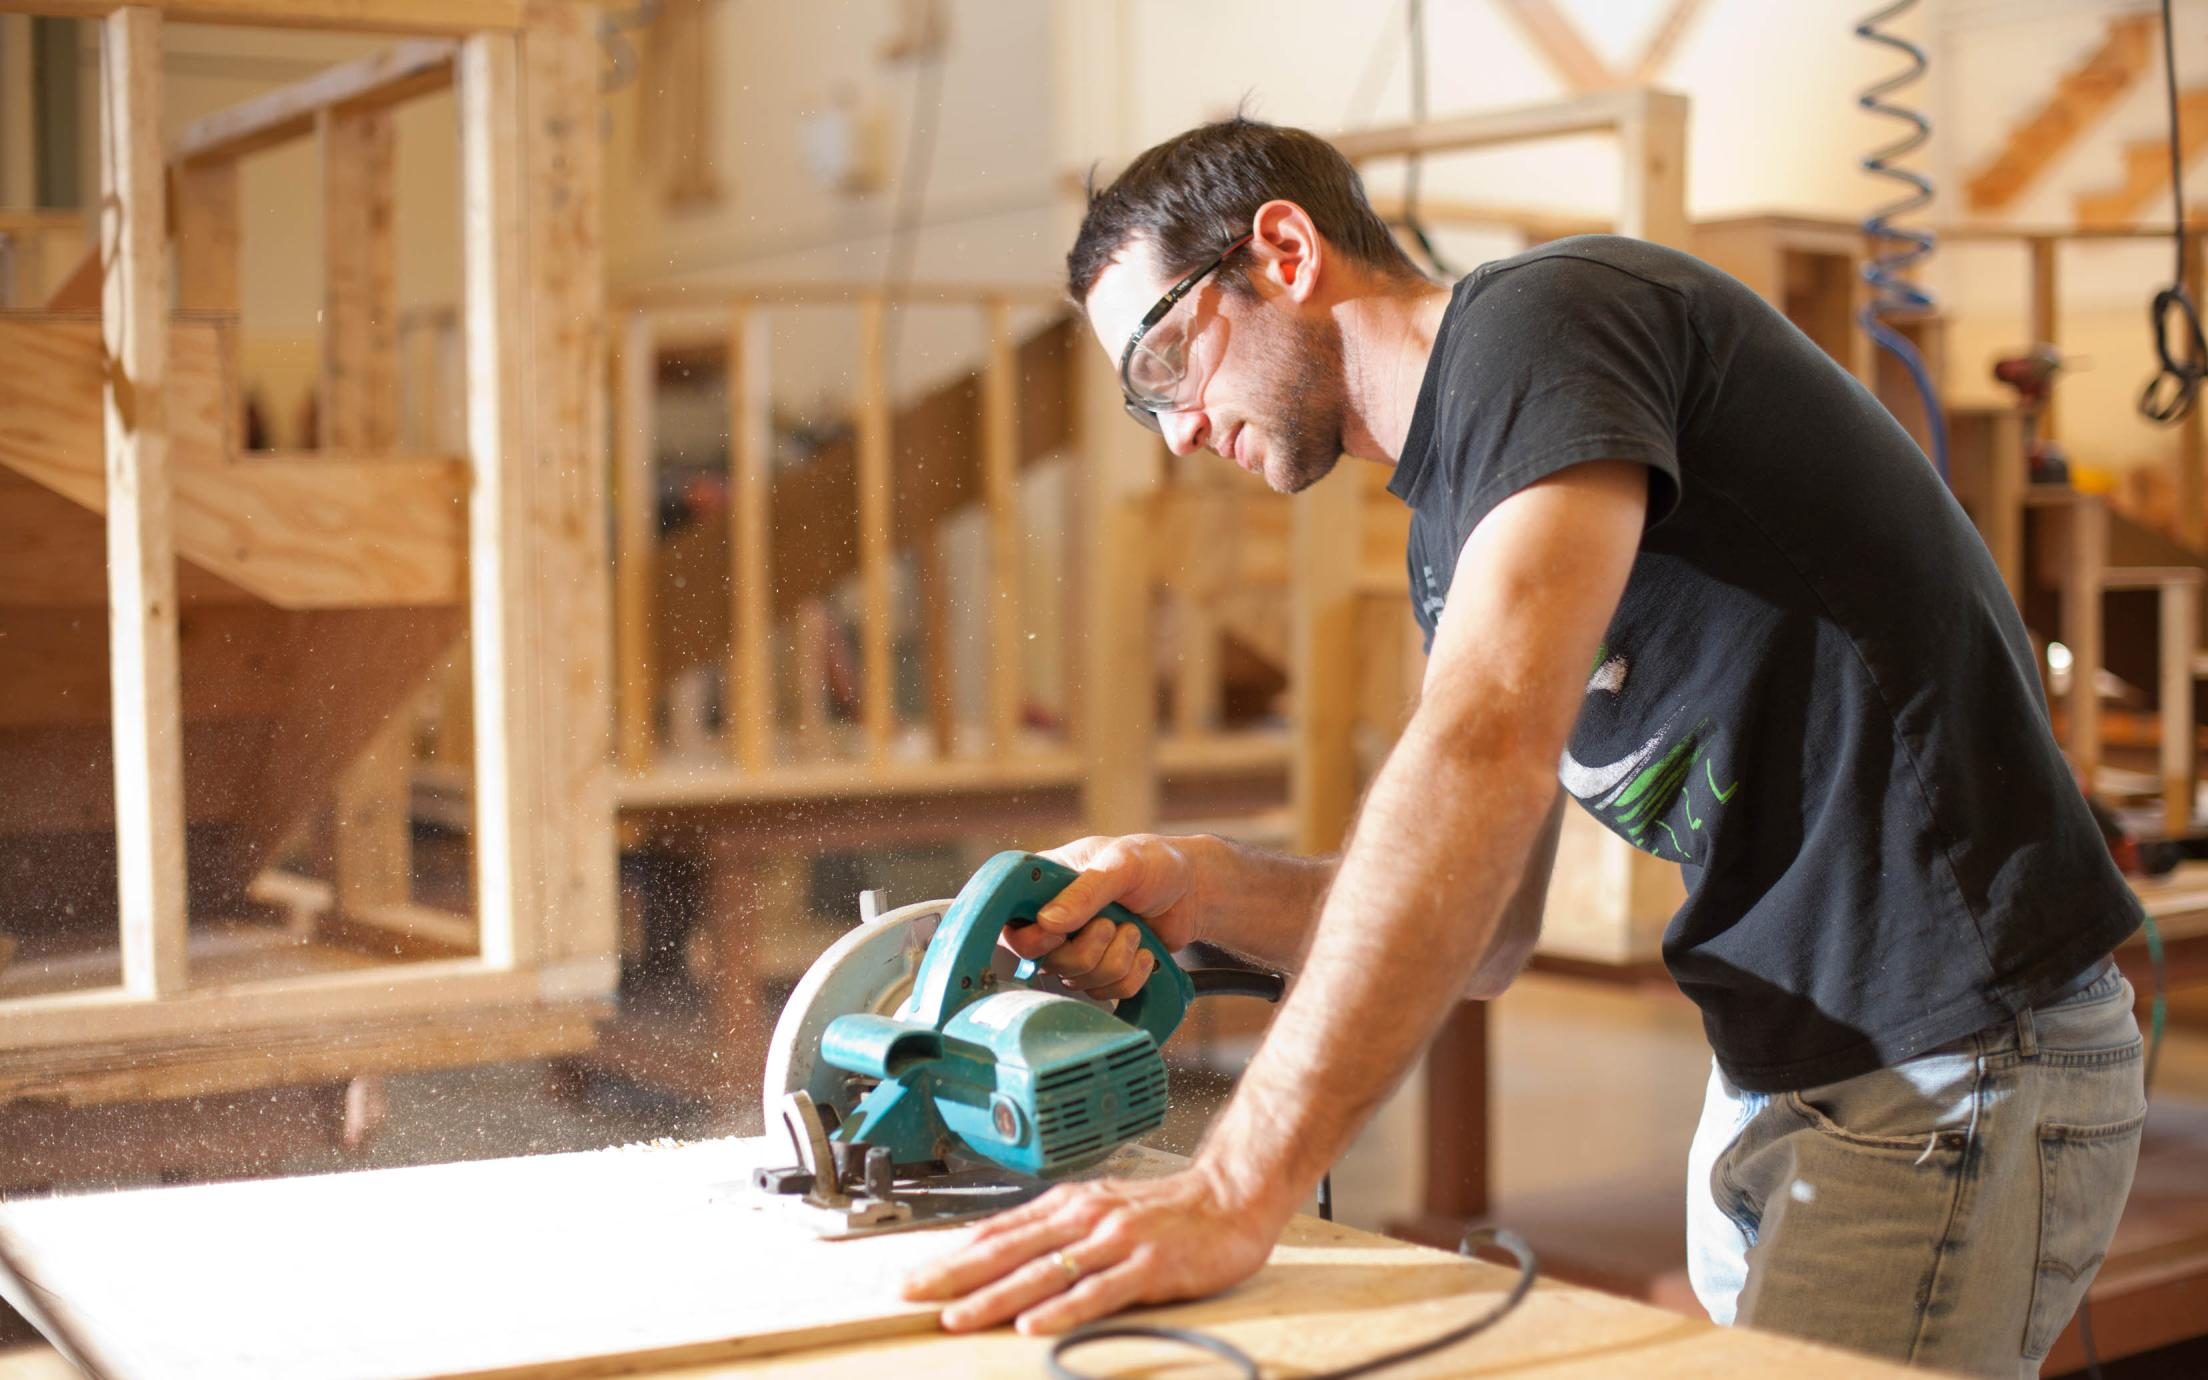 Carpentry Student, Steve Remple